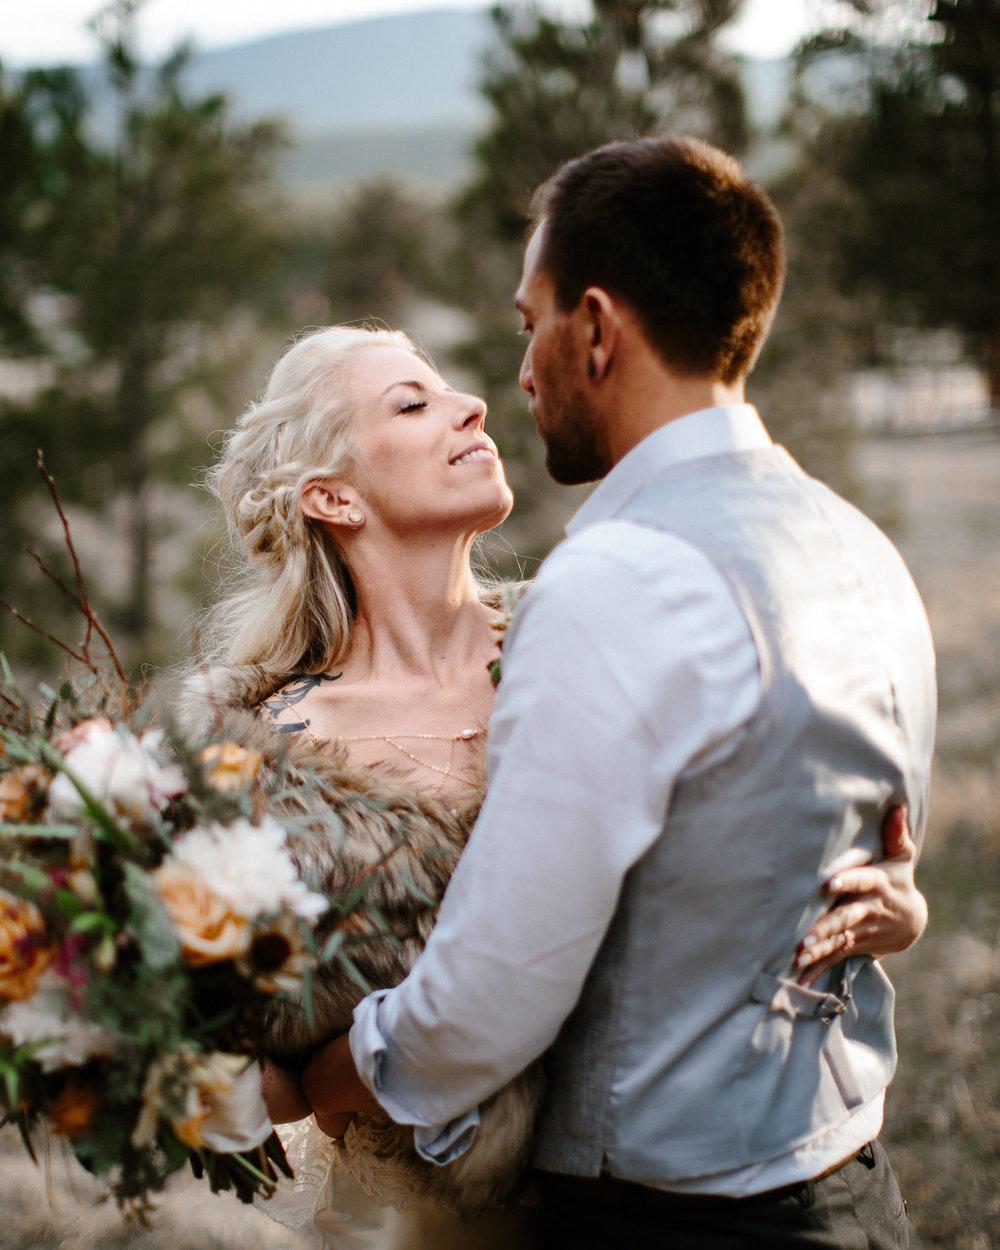 bucci-barn-wedding-elopement-evergreen-boulder-denver-colorado-adventerous-romantic-timeless-087.jpg